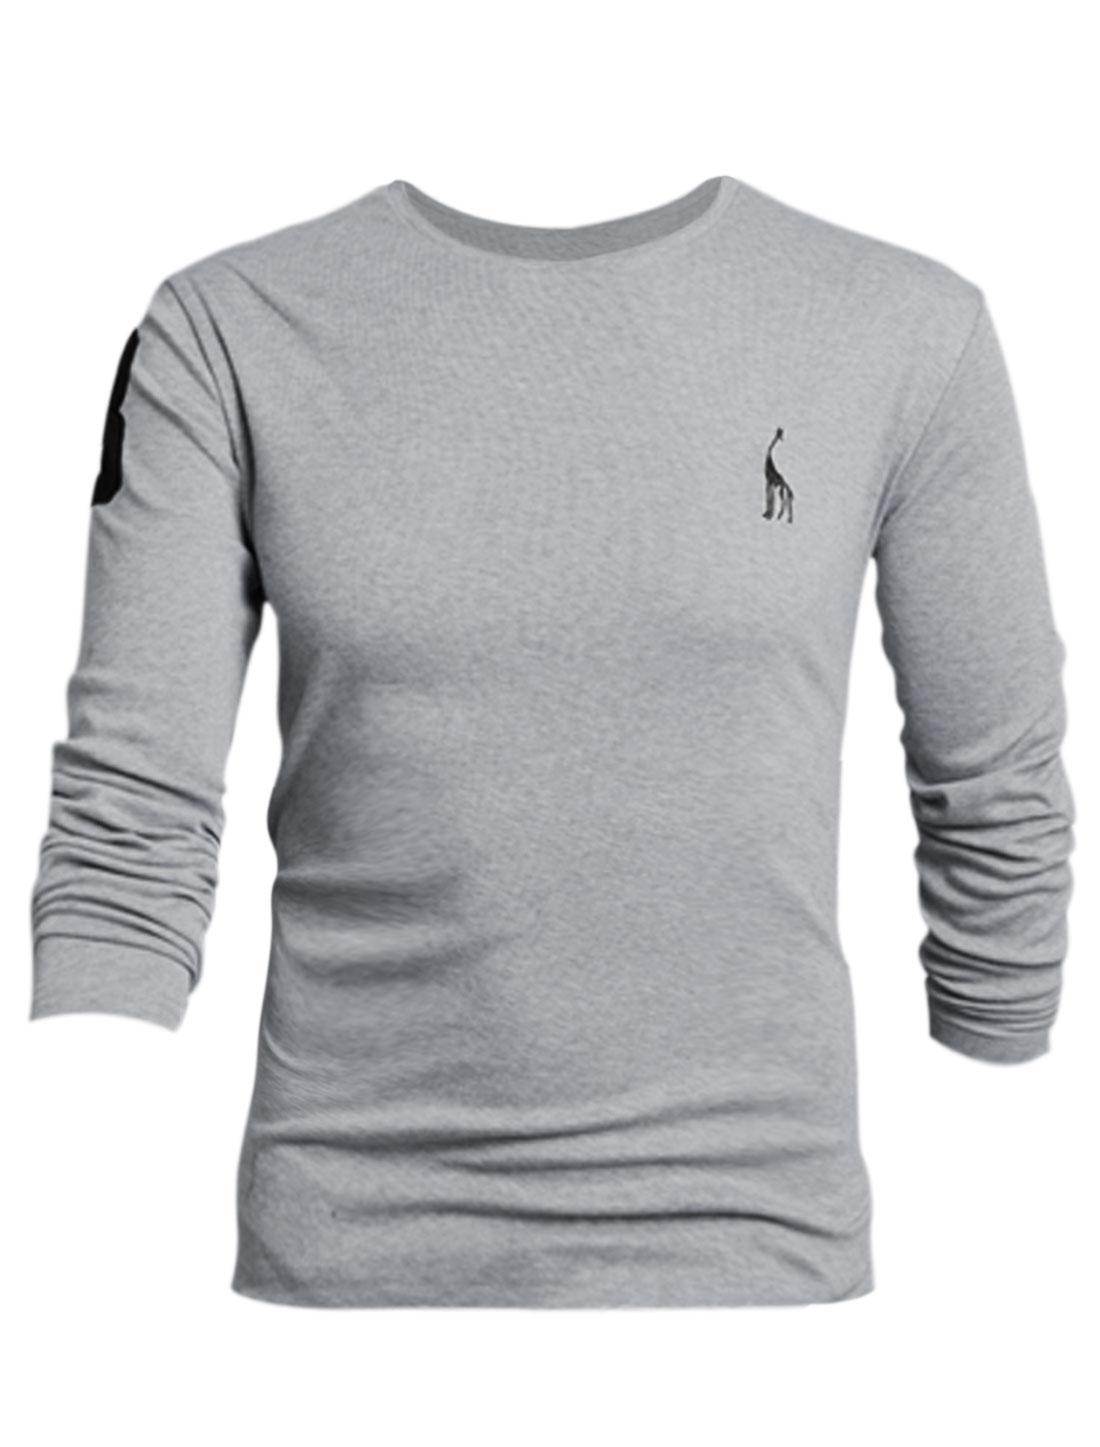 Men Deer Embroidery Slipover Design Cozy Fit Tee Shirt Light Gray L